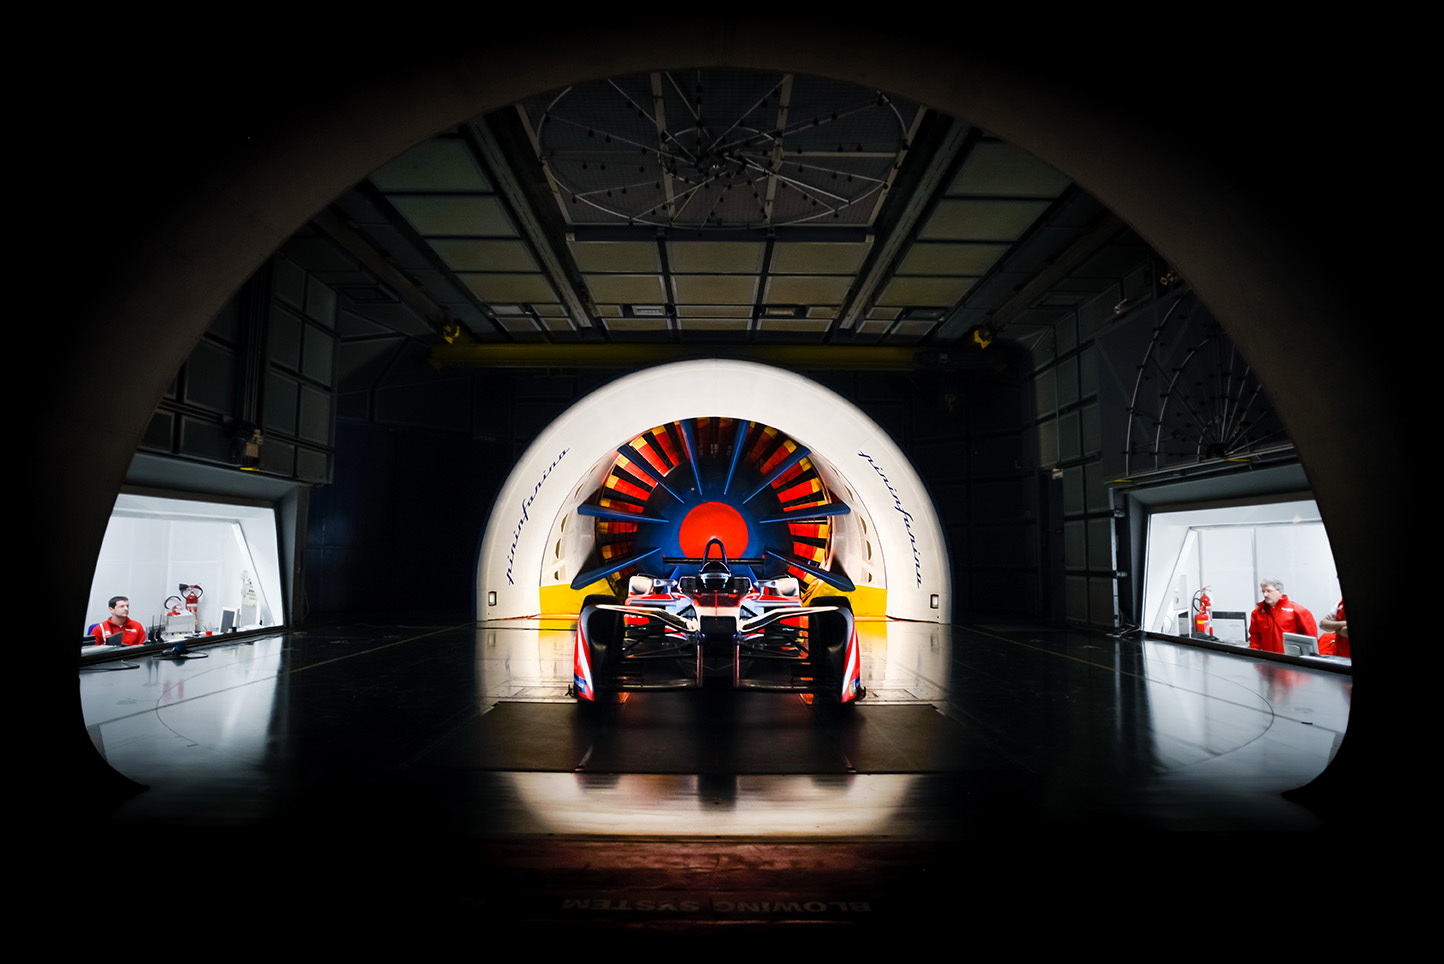 Spacesuit-Media-Marta-Rovatti-Studihrad-FIA-Formula-E-Mahindra-2018_MRS6938